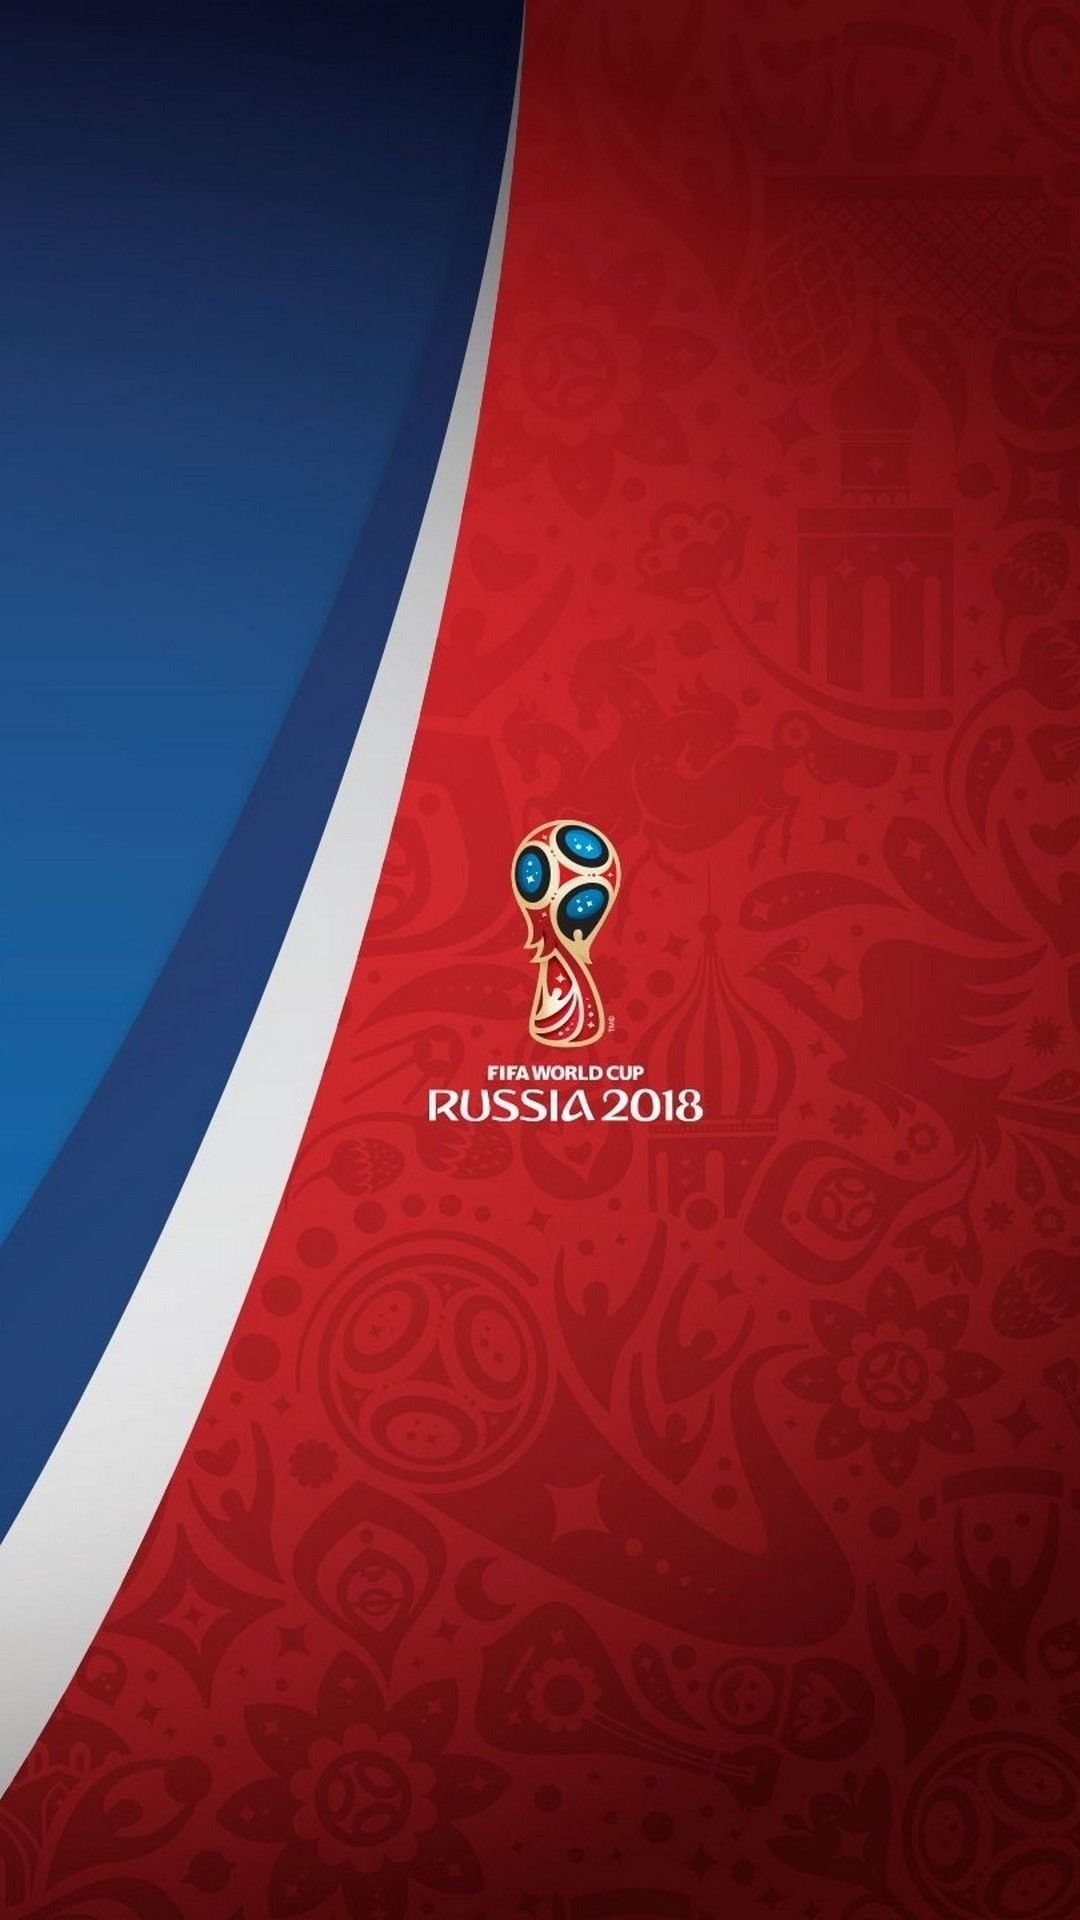 iPhone X Wallpaper World Cup Russia | FIFA World Cup Wallpapers | Copa del mundo, Equipo de ...